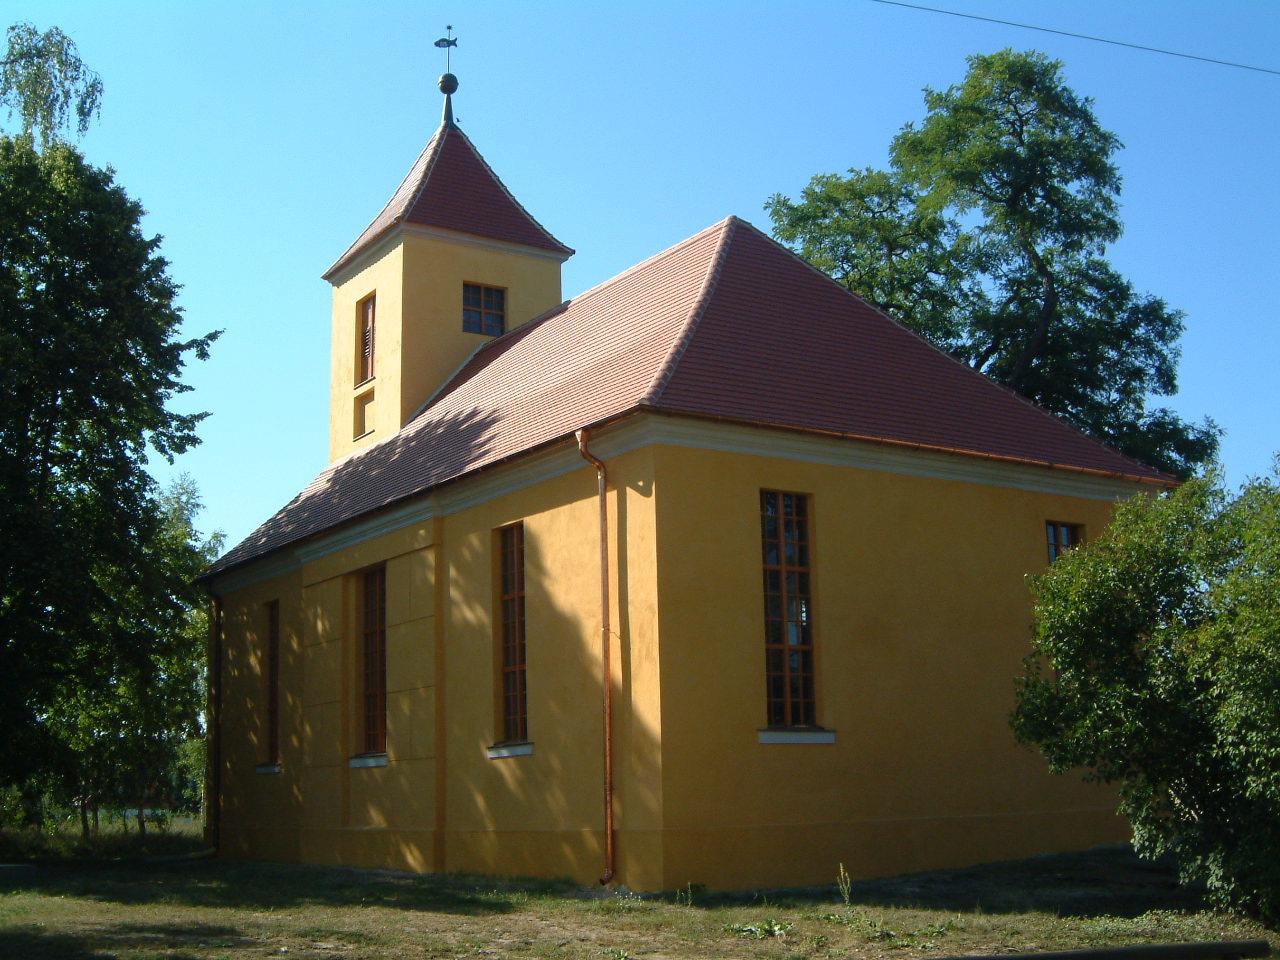 Dorfkirche Weindorf